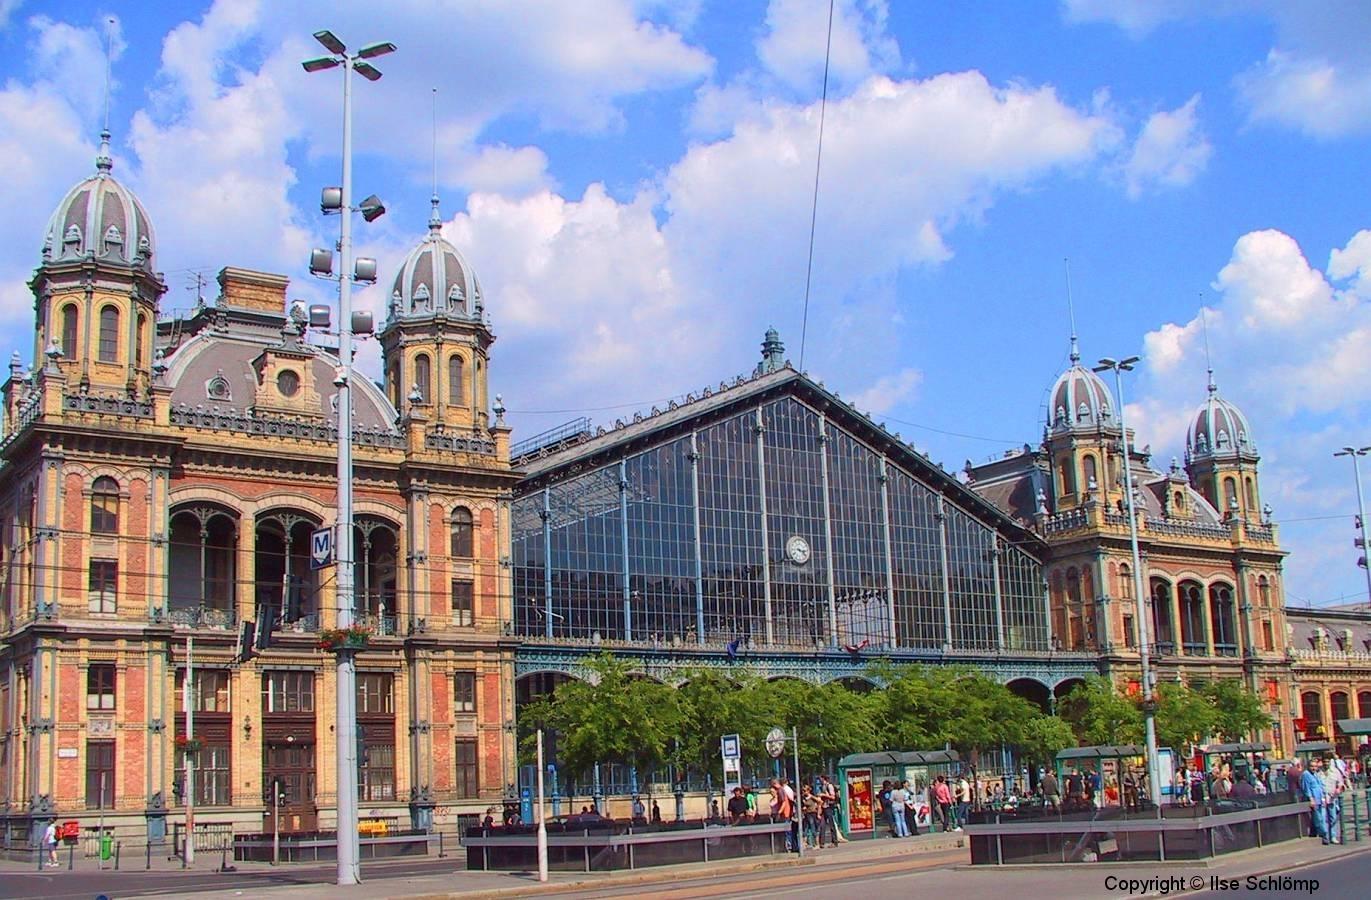 Ungarn, Budapest, Westbahnhof